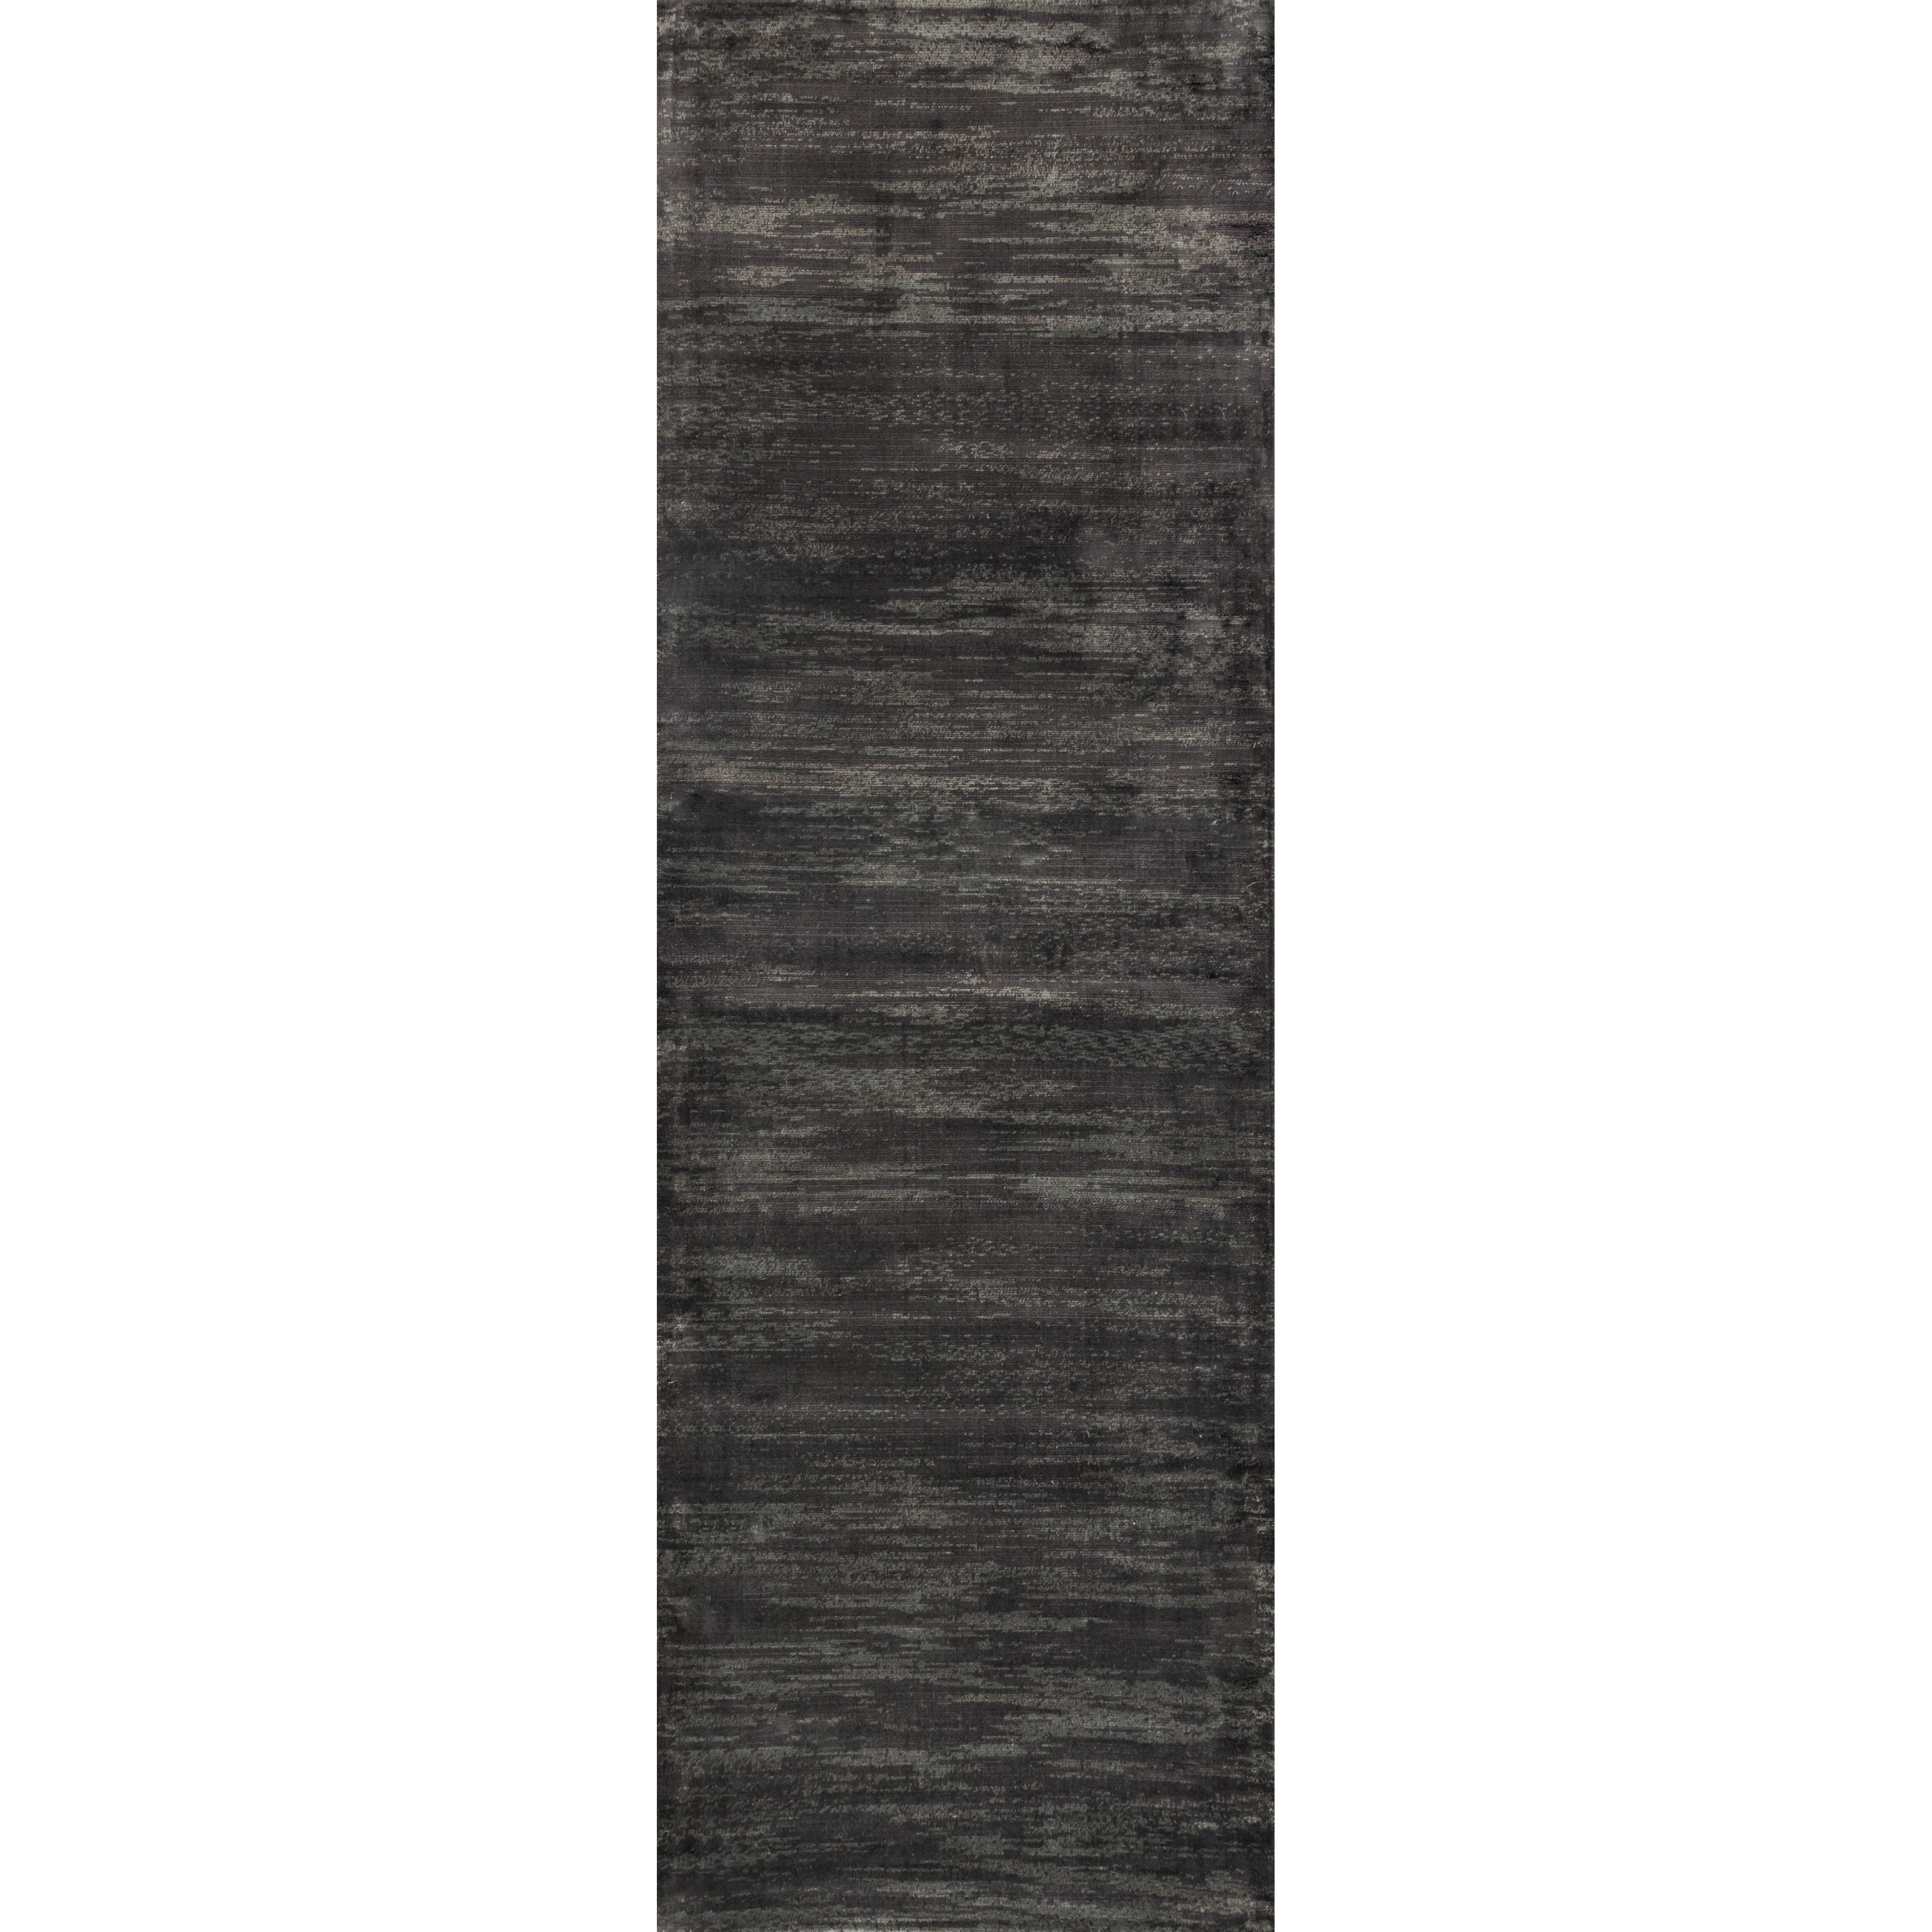 Alexander Home Francis Iron Runner Rug (2'4 x 7'9) (Iron ...